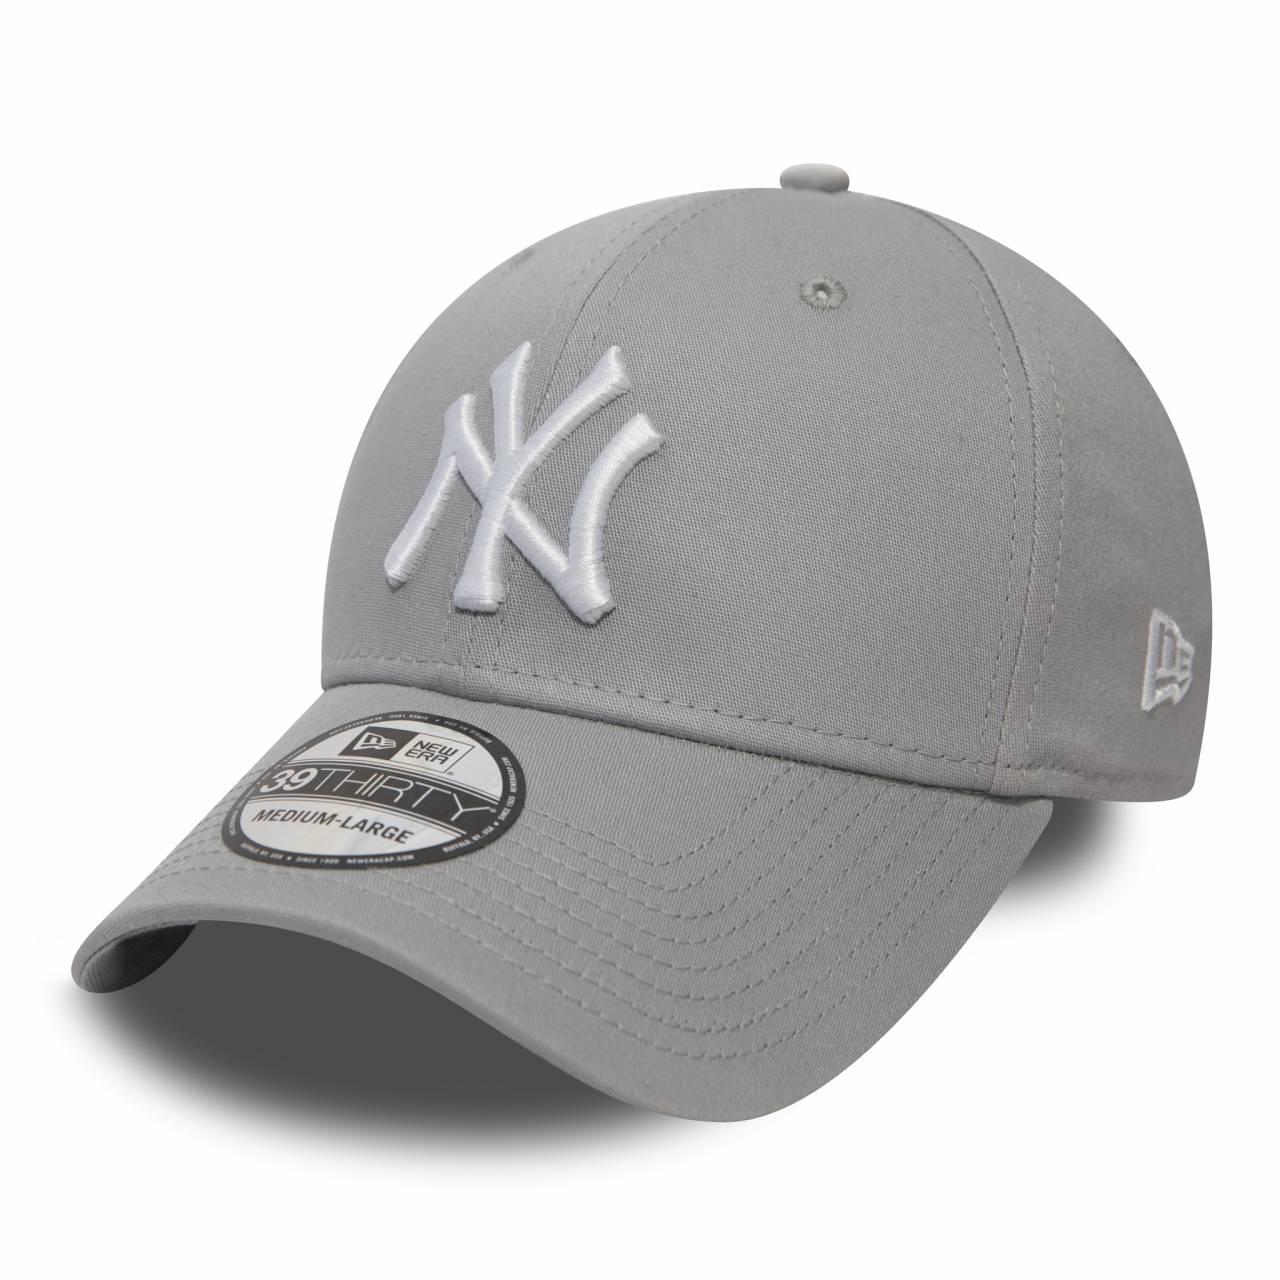 10298279 39THIRTY NEW YORK YANKEES STRETCH GREY/WHITE CAP